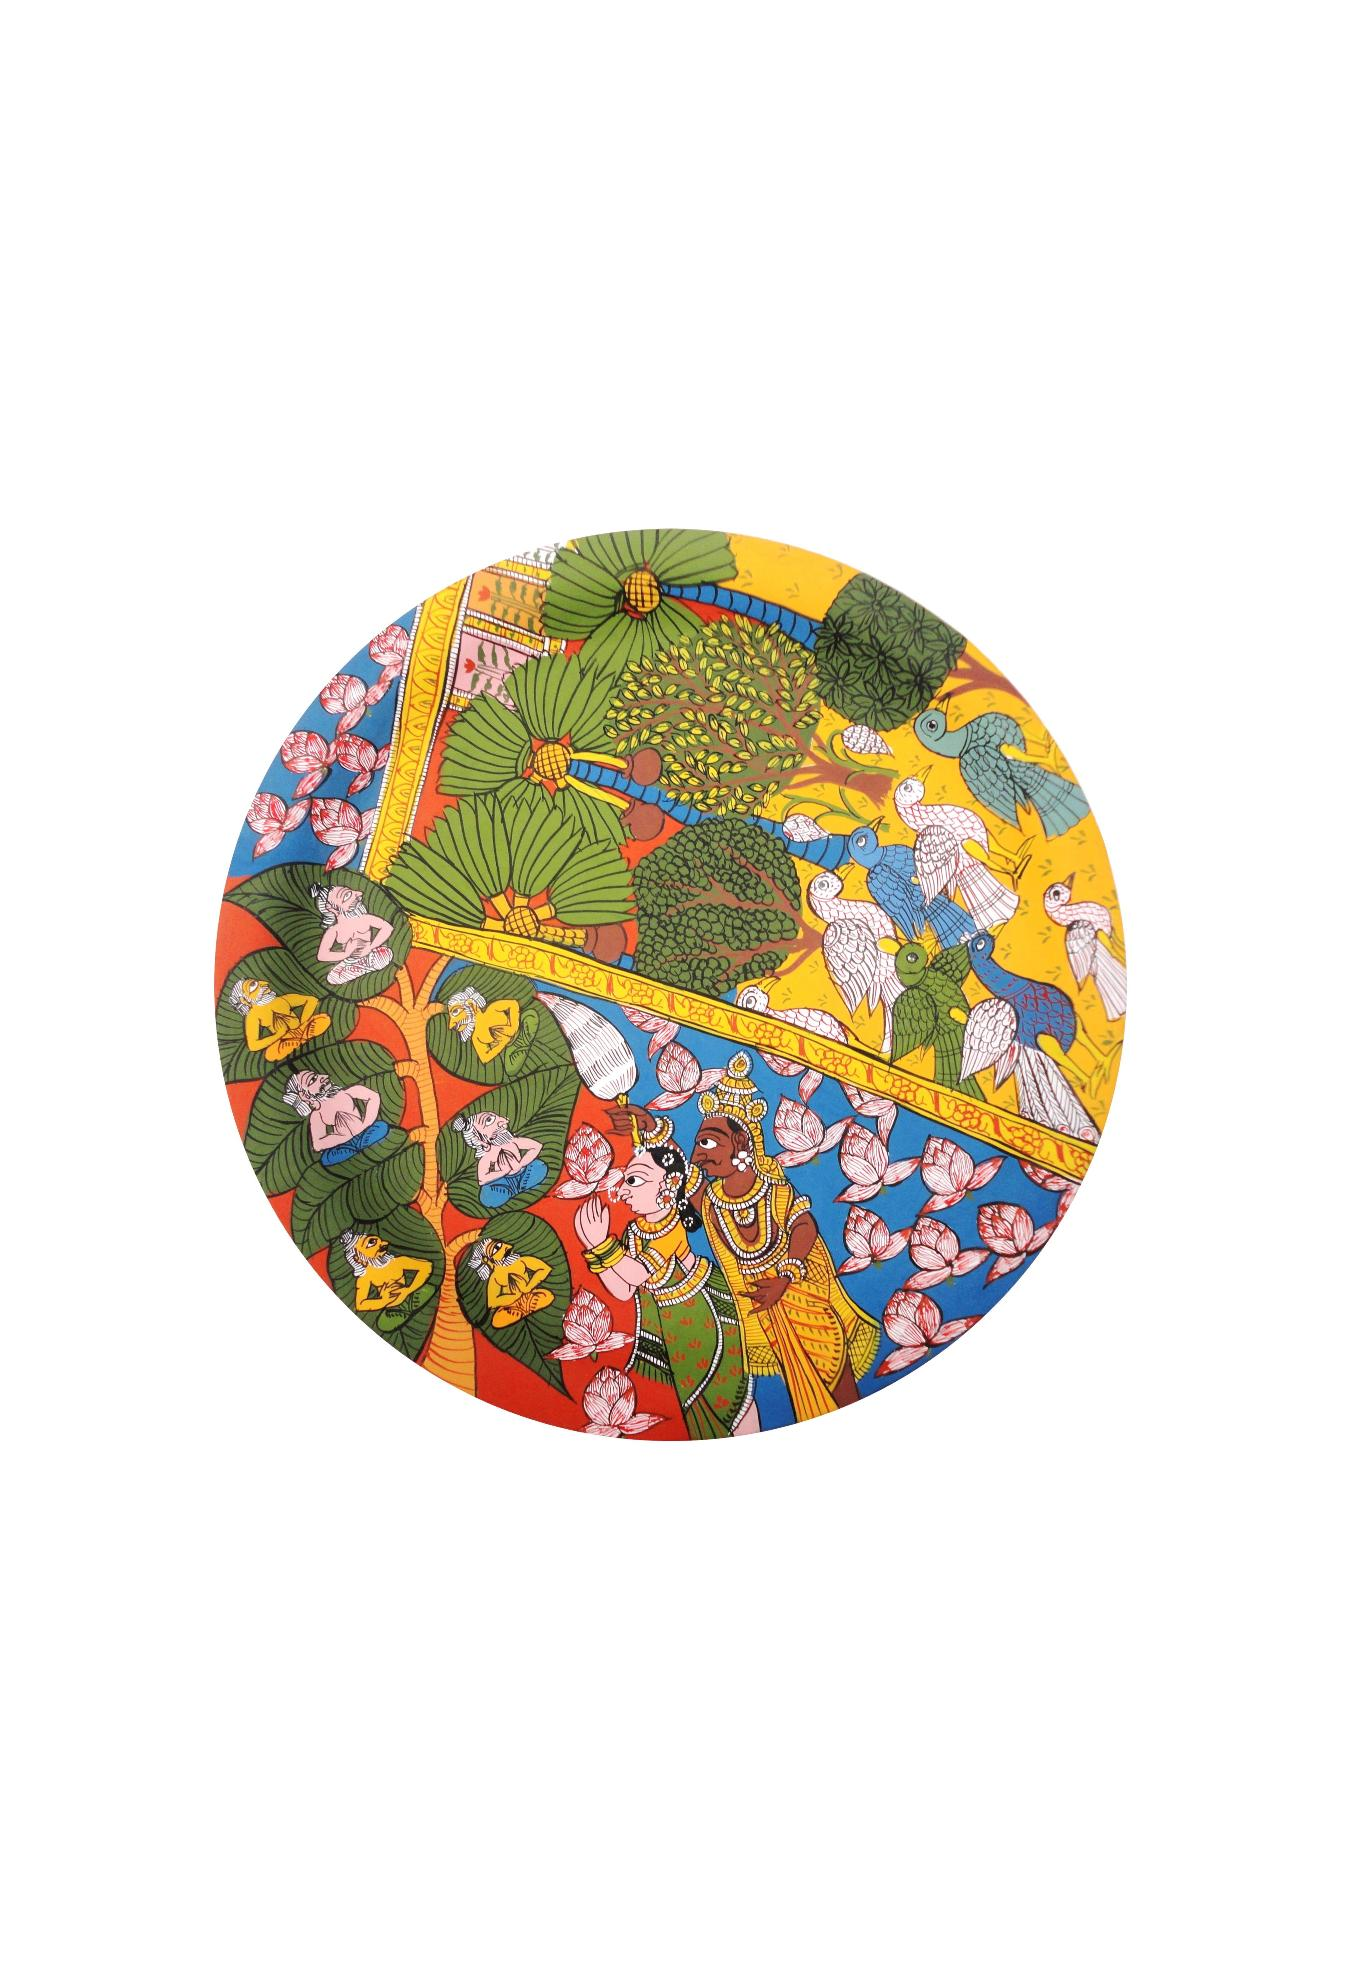 Seven Priests in Cheriyal Painting